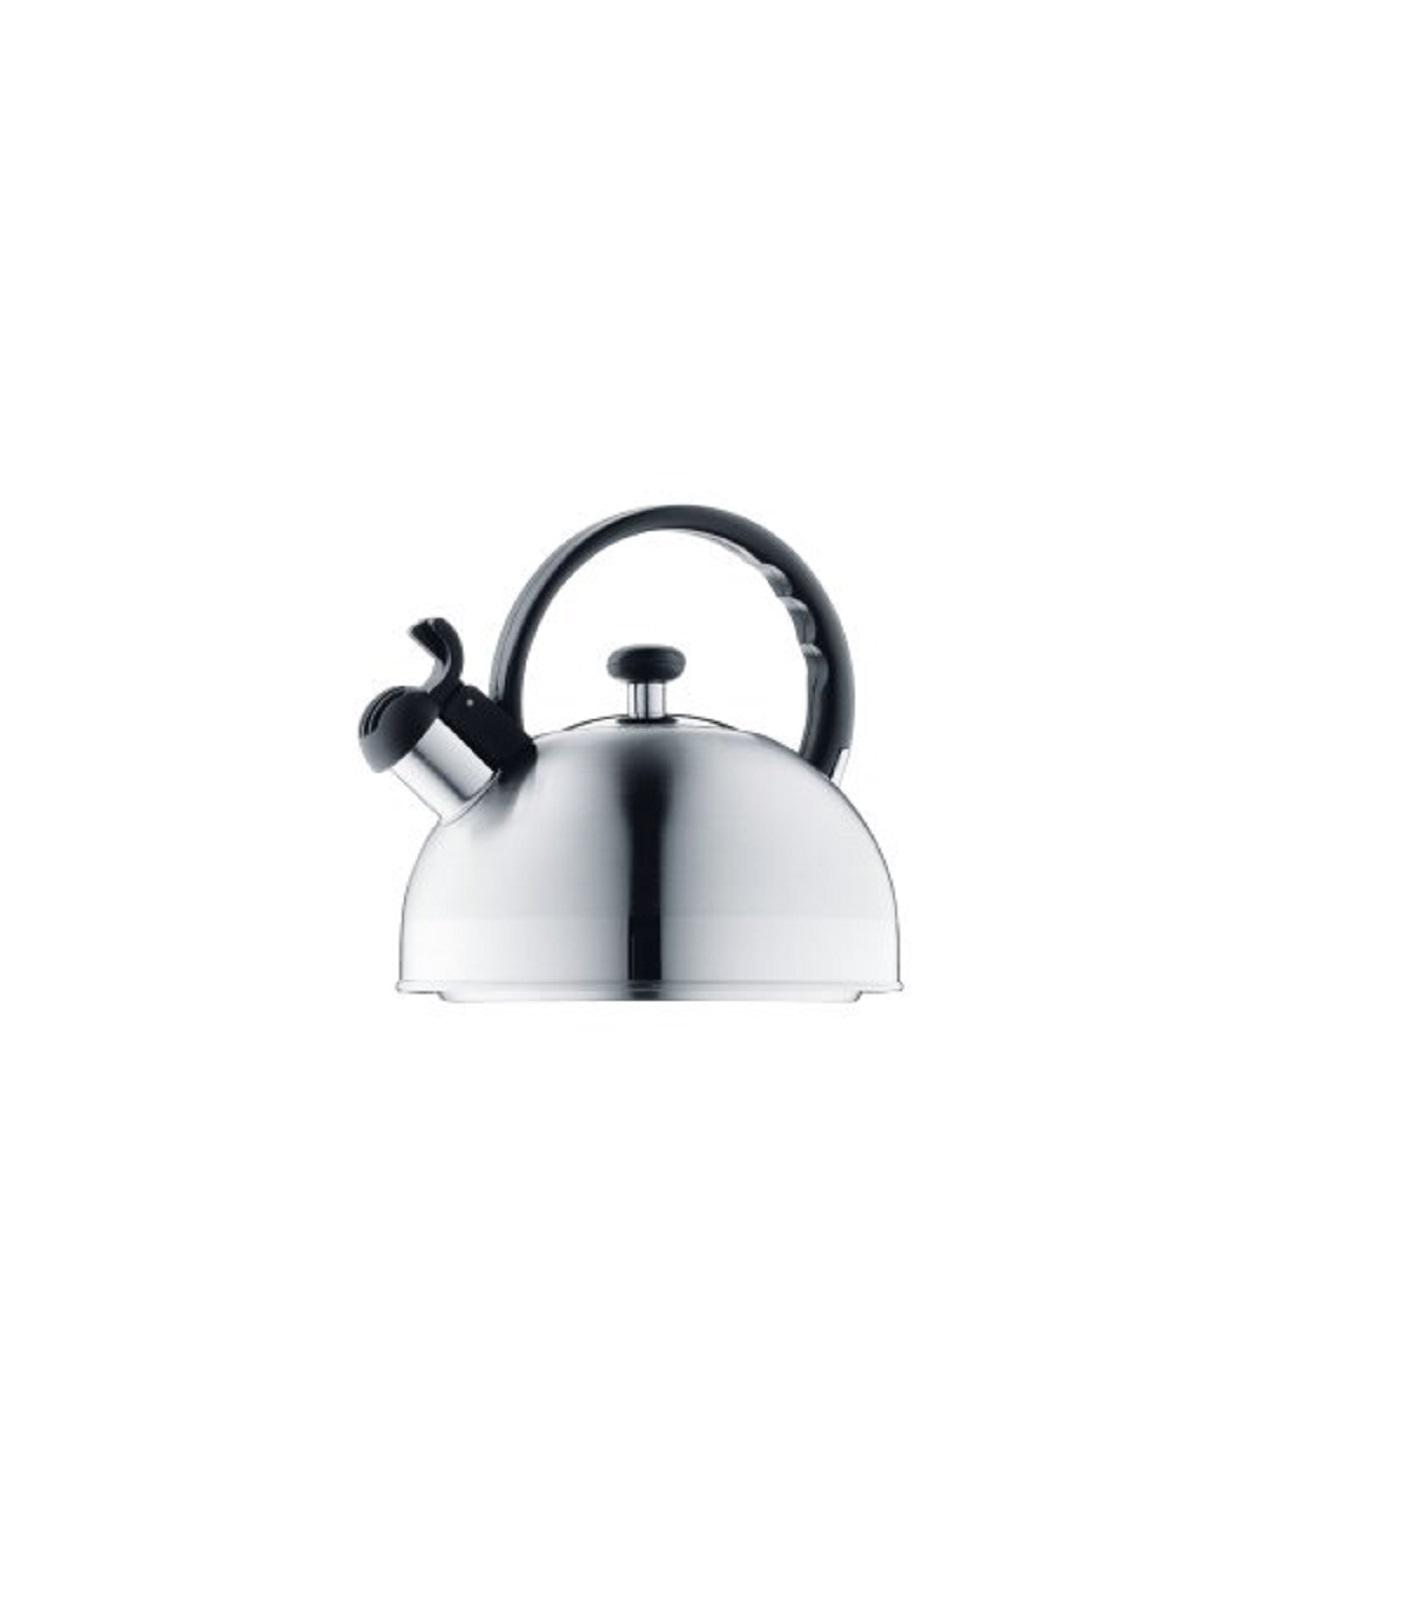 Онлайн каталог PROMENU: Чайник с крышкой WMF ORBIT, объем 1,5 л, серебристый WMF 07 3174 6030 SP